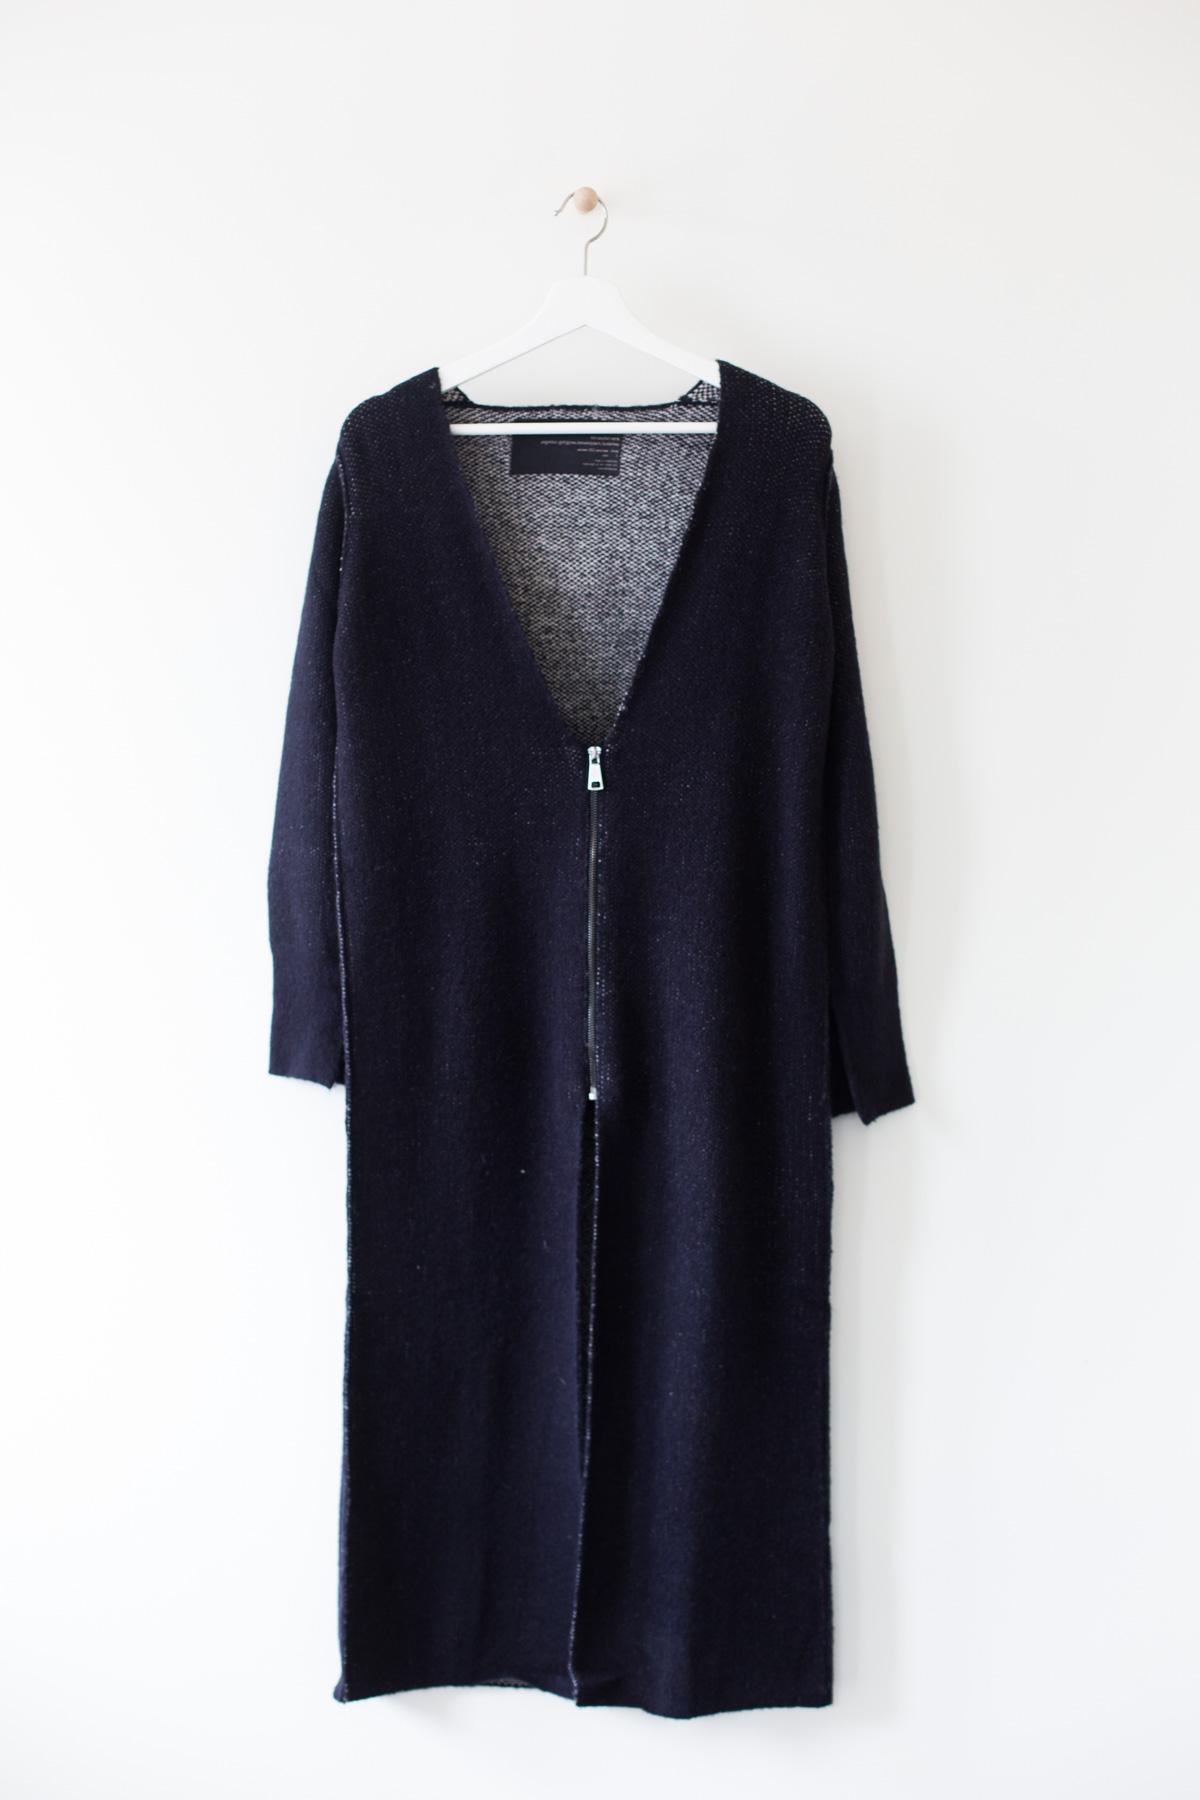 Wundervoll Moderne Pullover Beste Wahl Seam Stitch Sweater